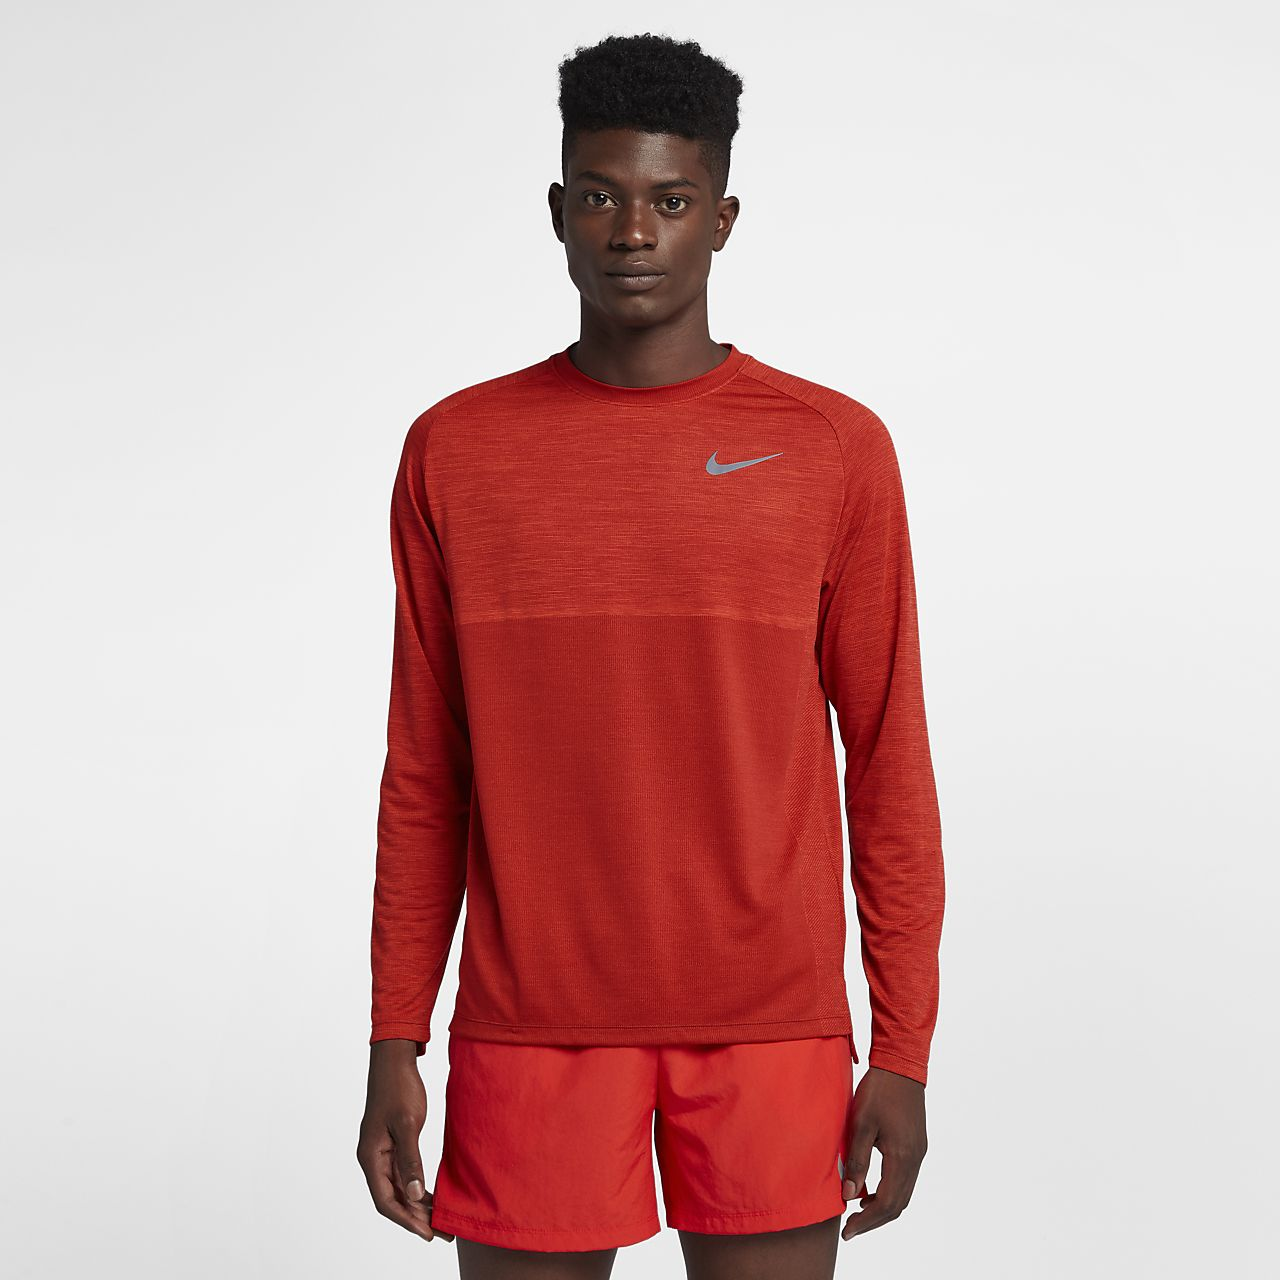 0977ac97 Nike Dri-FIT Medalist Men's Long-Sleeve Running Top. Nike.com GB